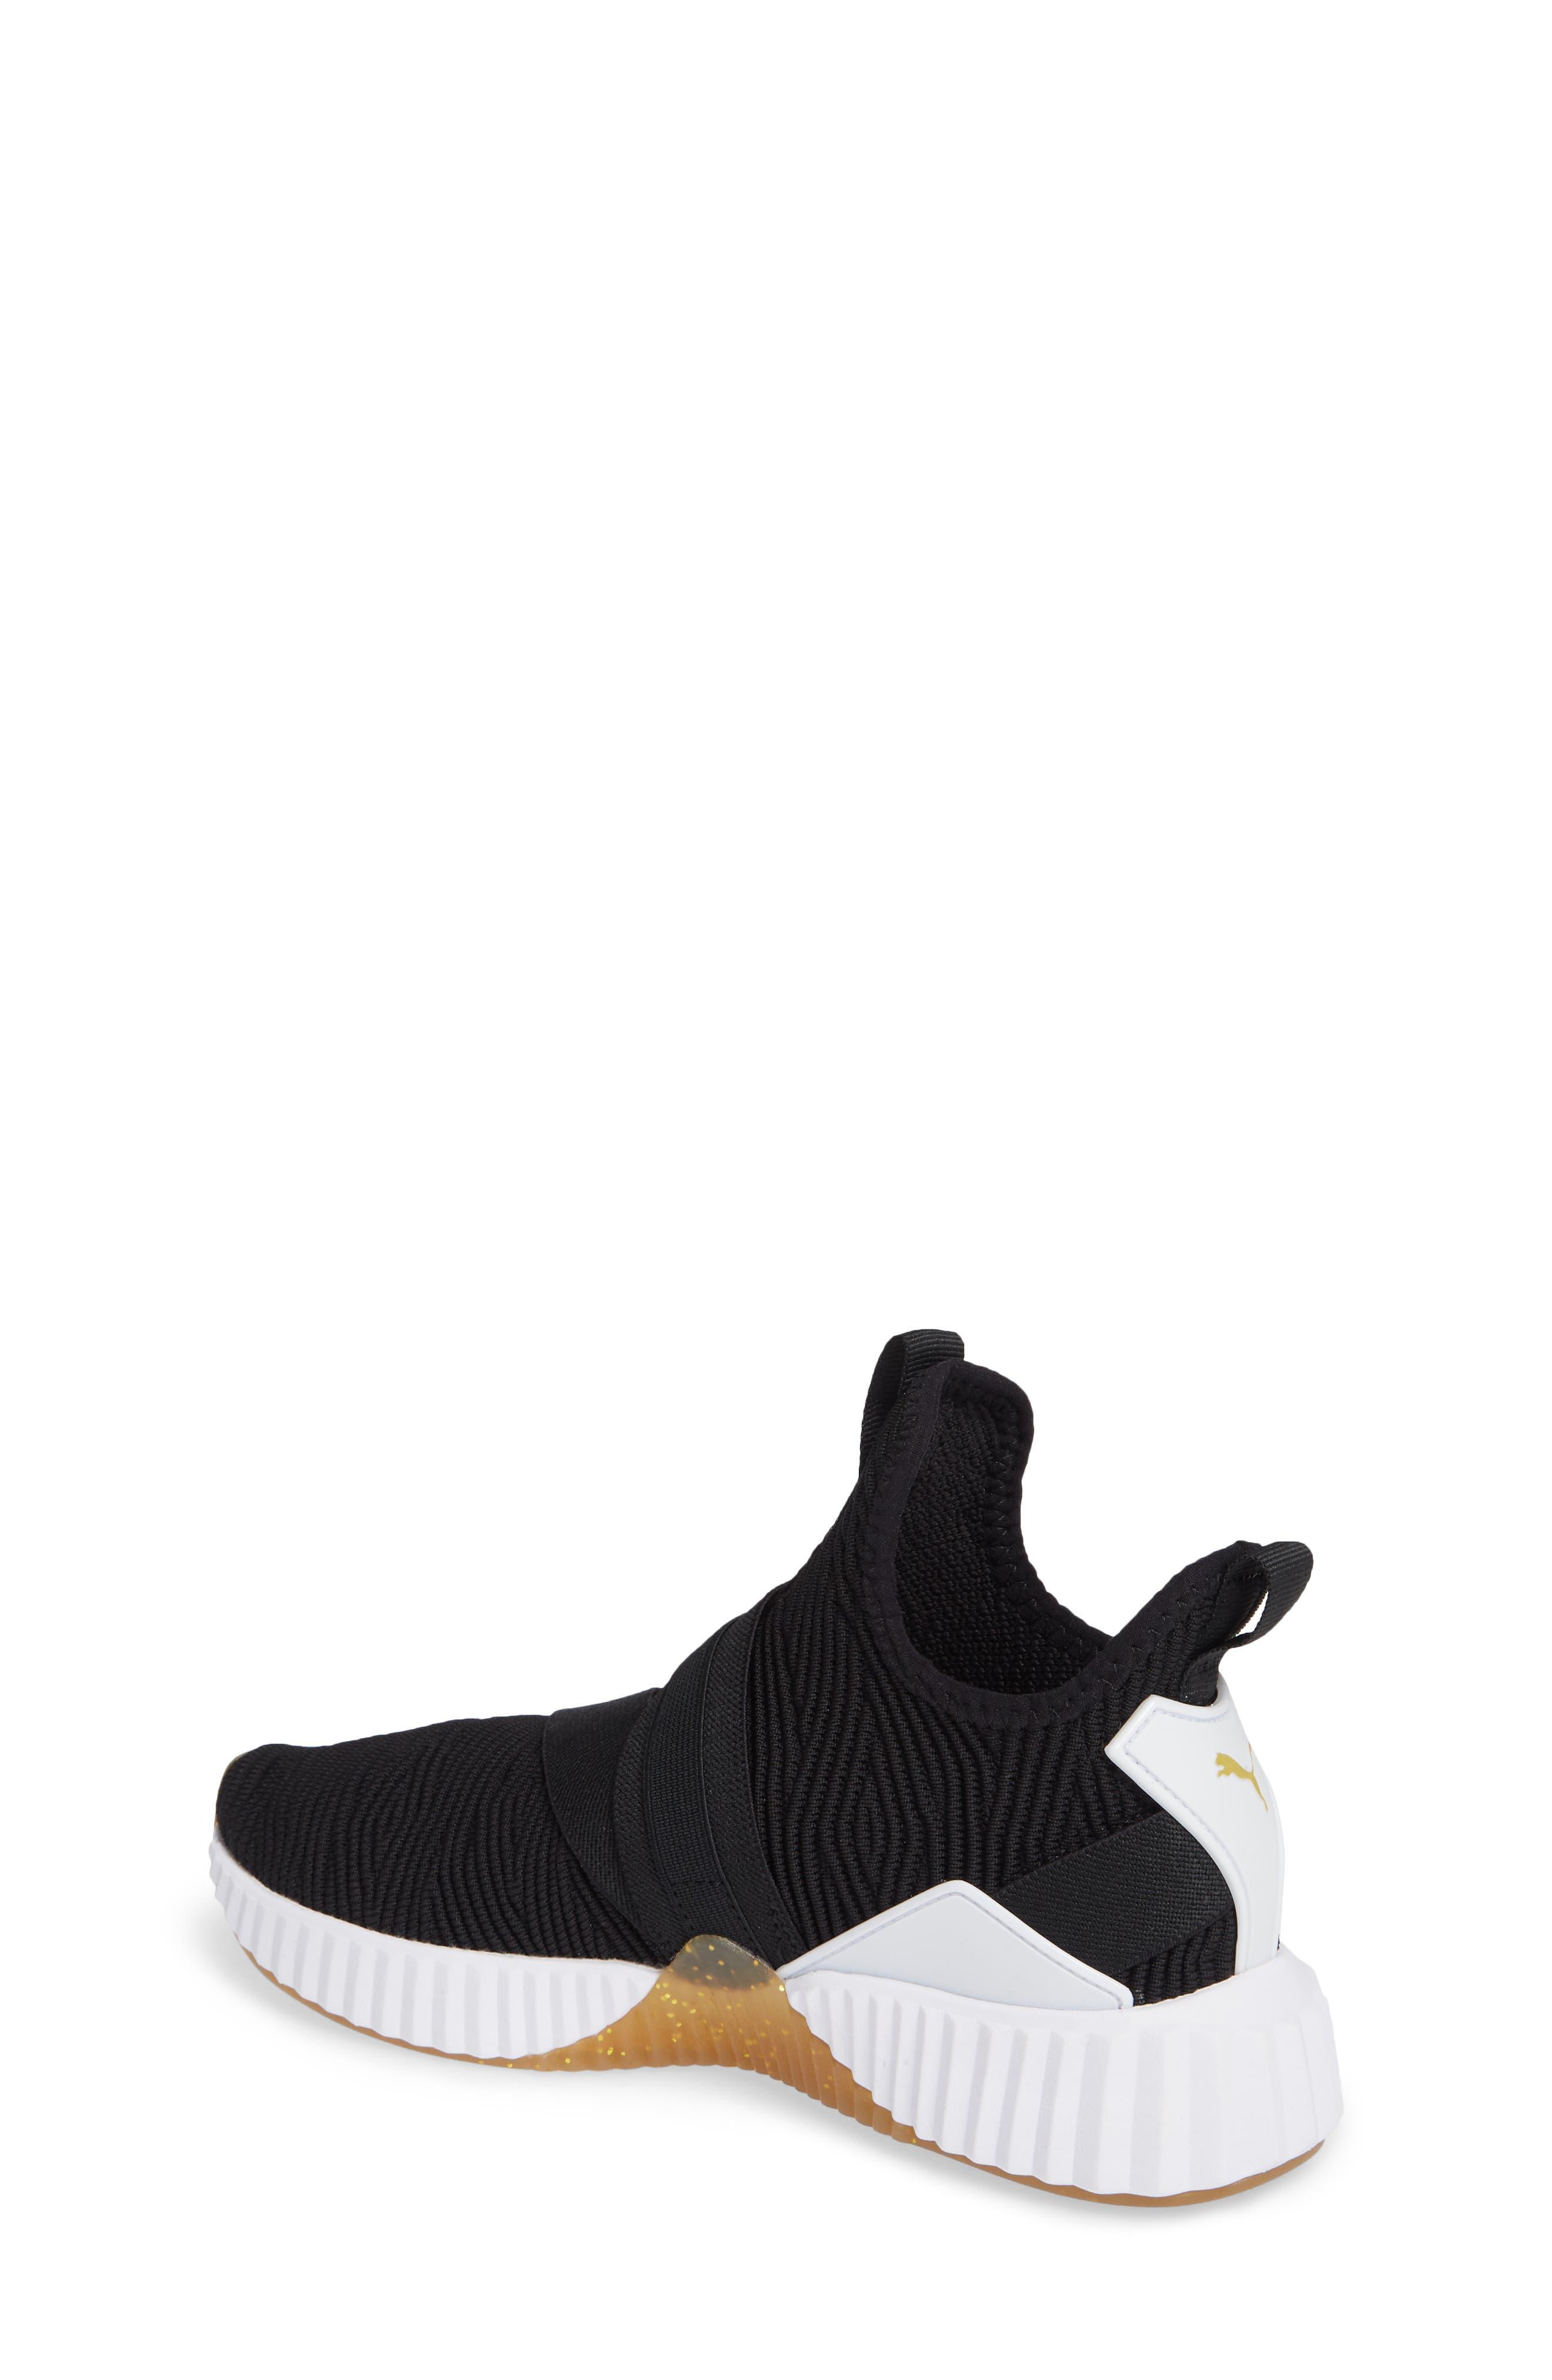 PUMA, Defy Mid Varsity Sneaker, Alternate thumbnail 2, color, BLACK/ METALLIC GOLD